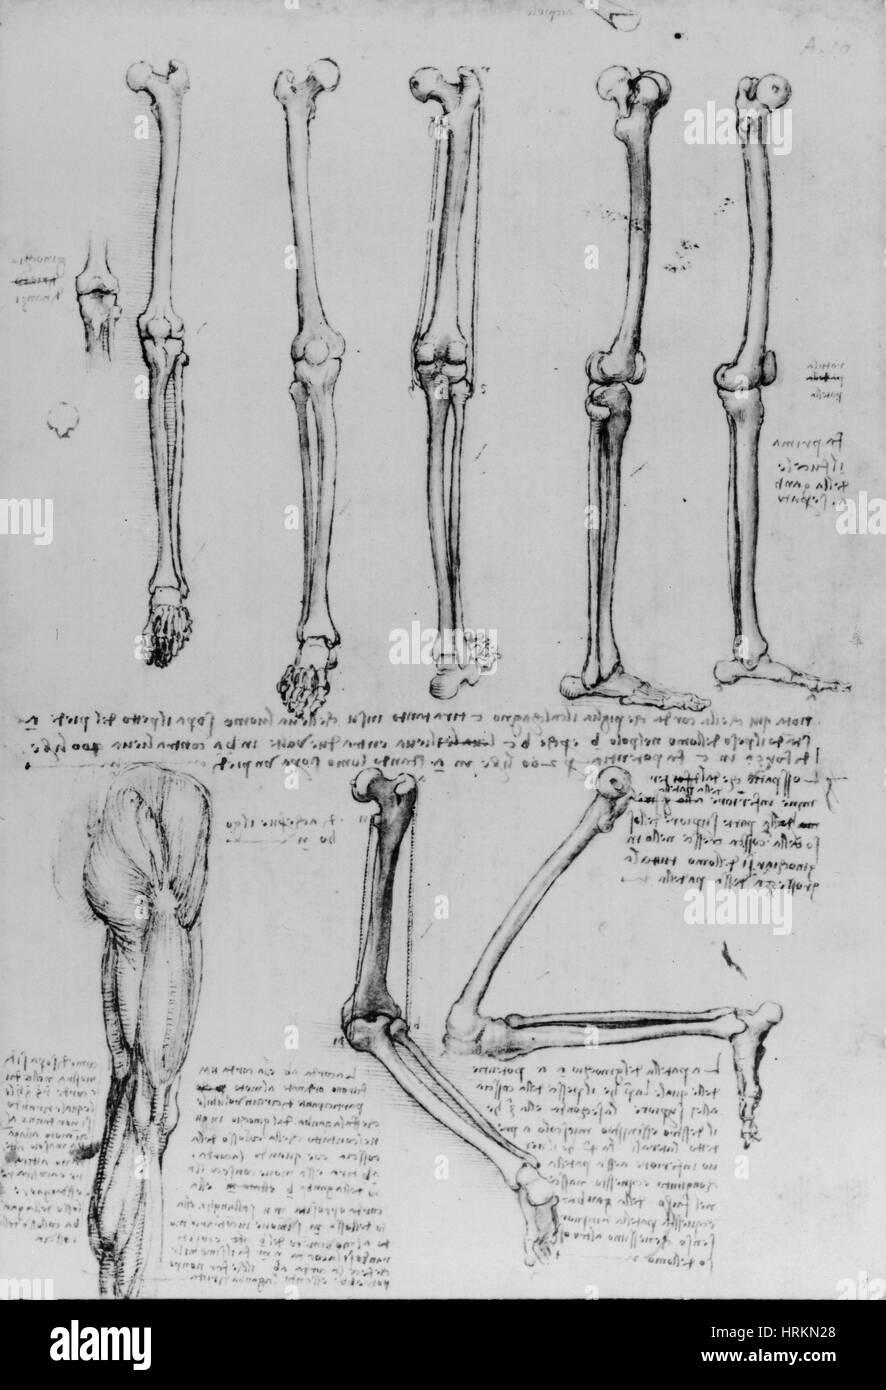 Da Vinci Anatomical Drawings - Stock Image